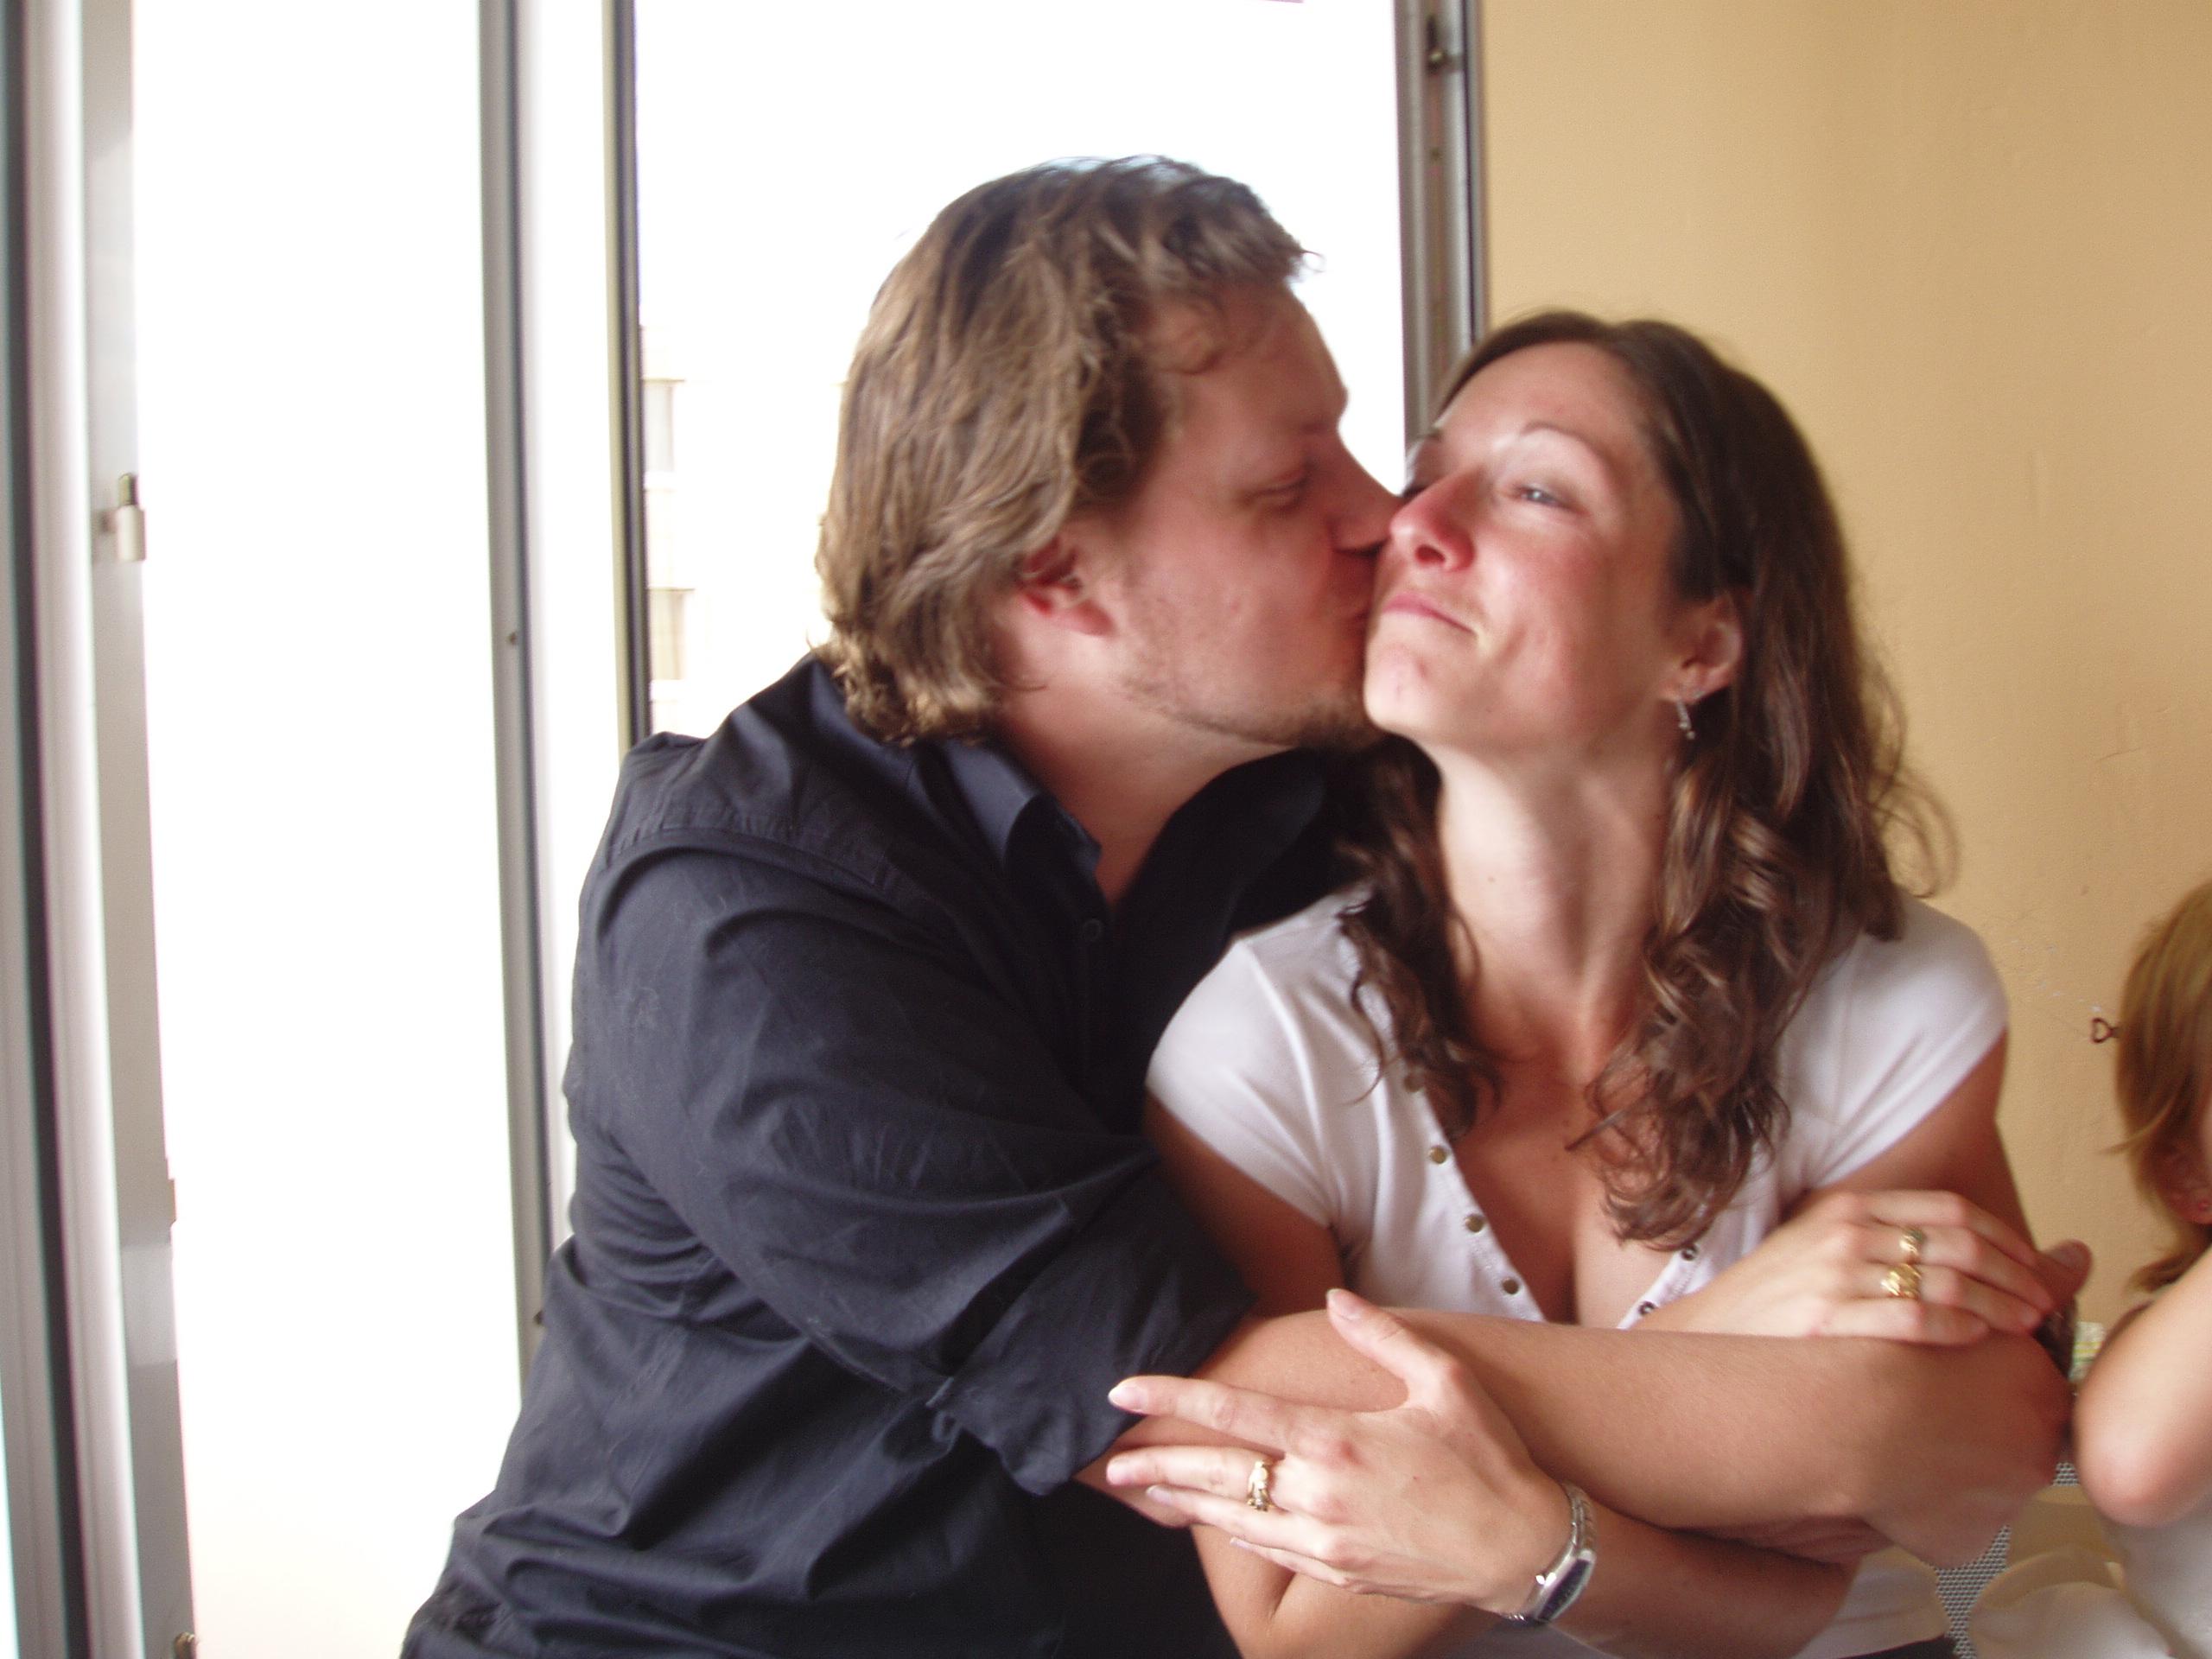 Carotte et Greg